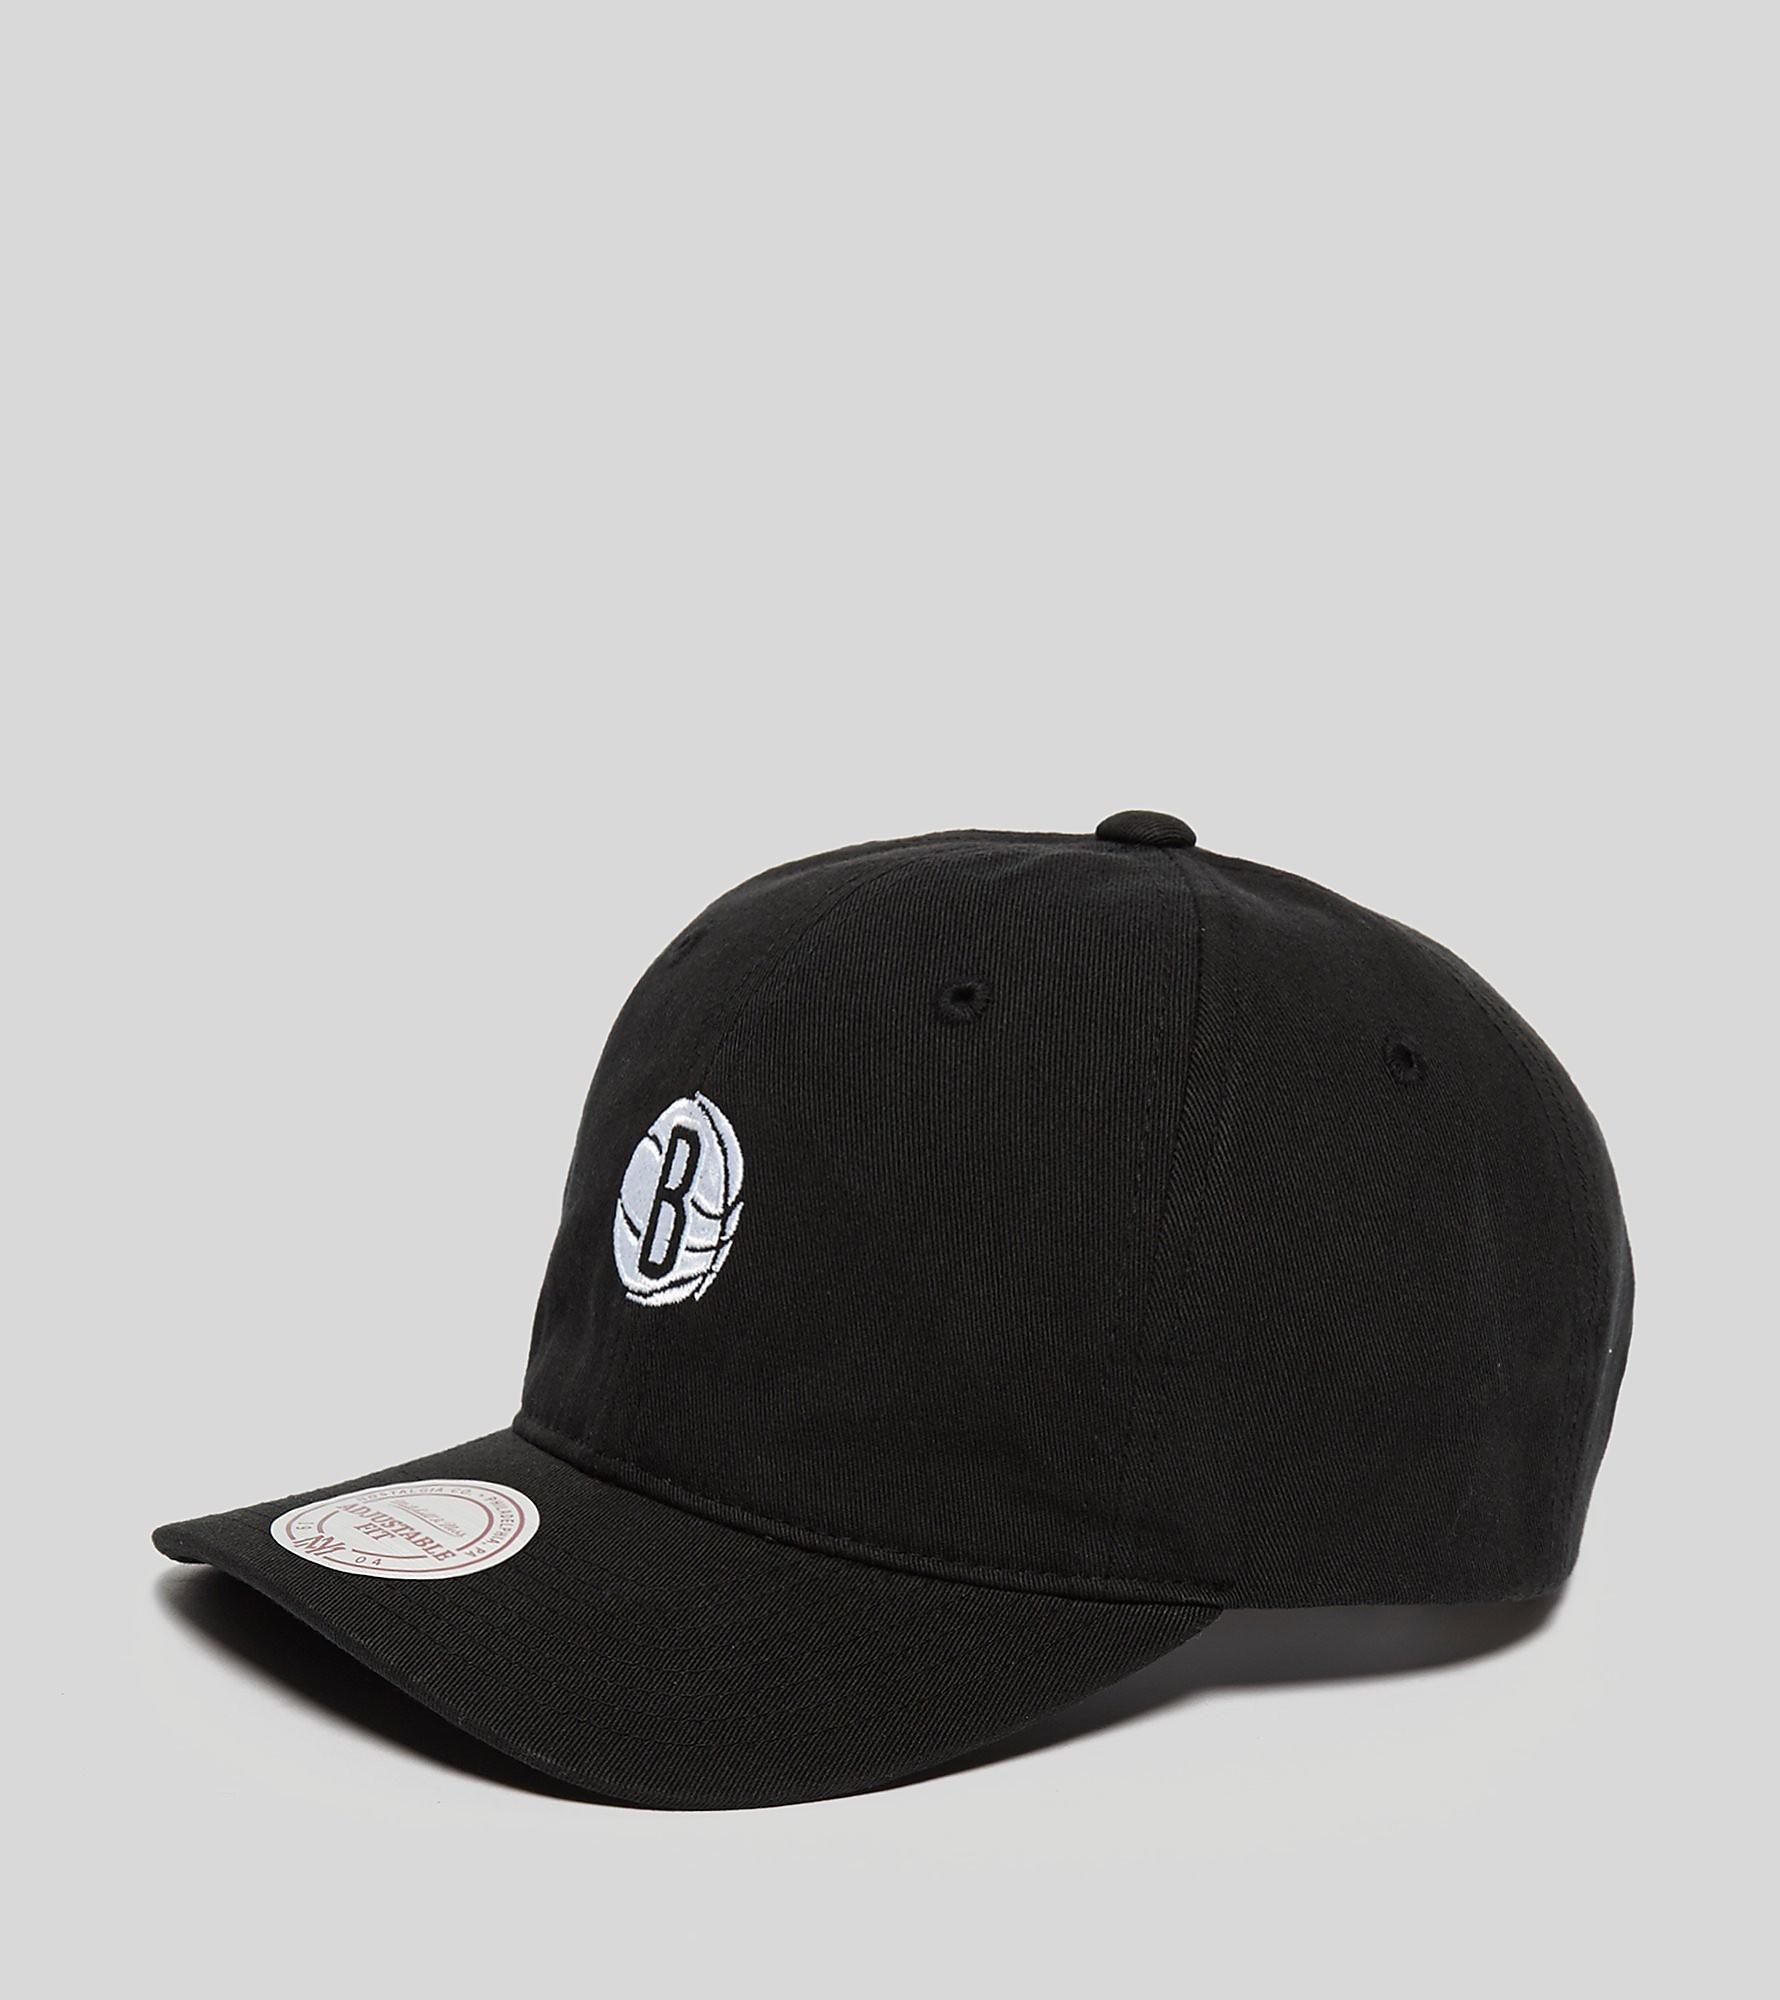 Mitchell & Ness Brooklyn Nets Chukker Snapback Cap